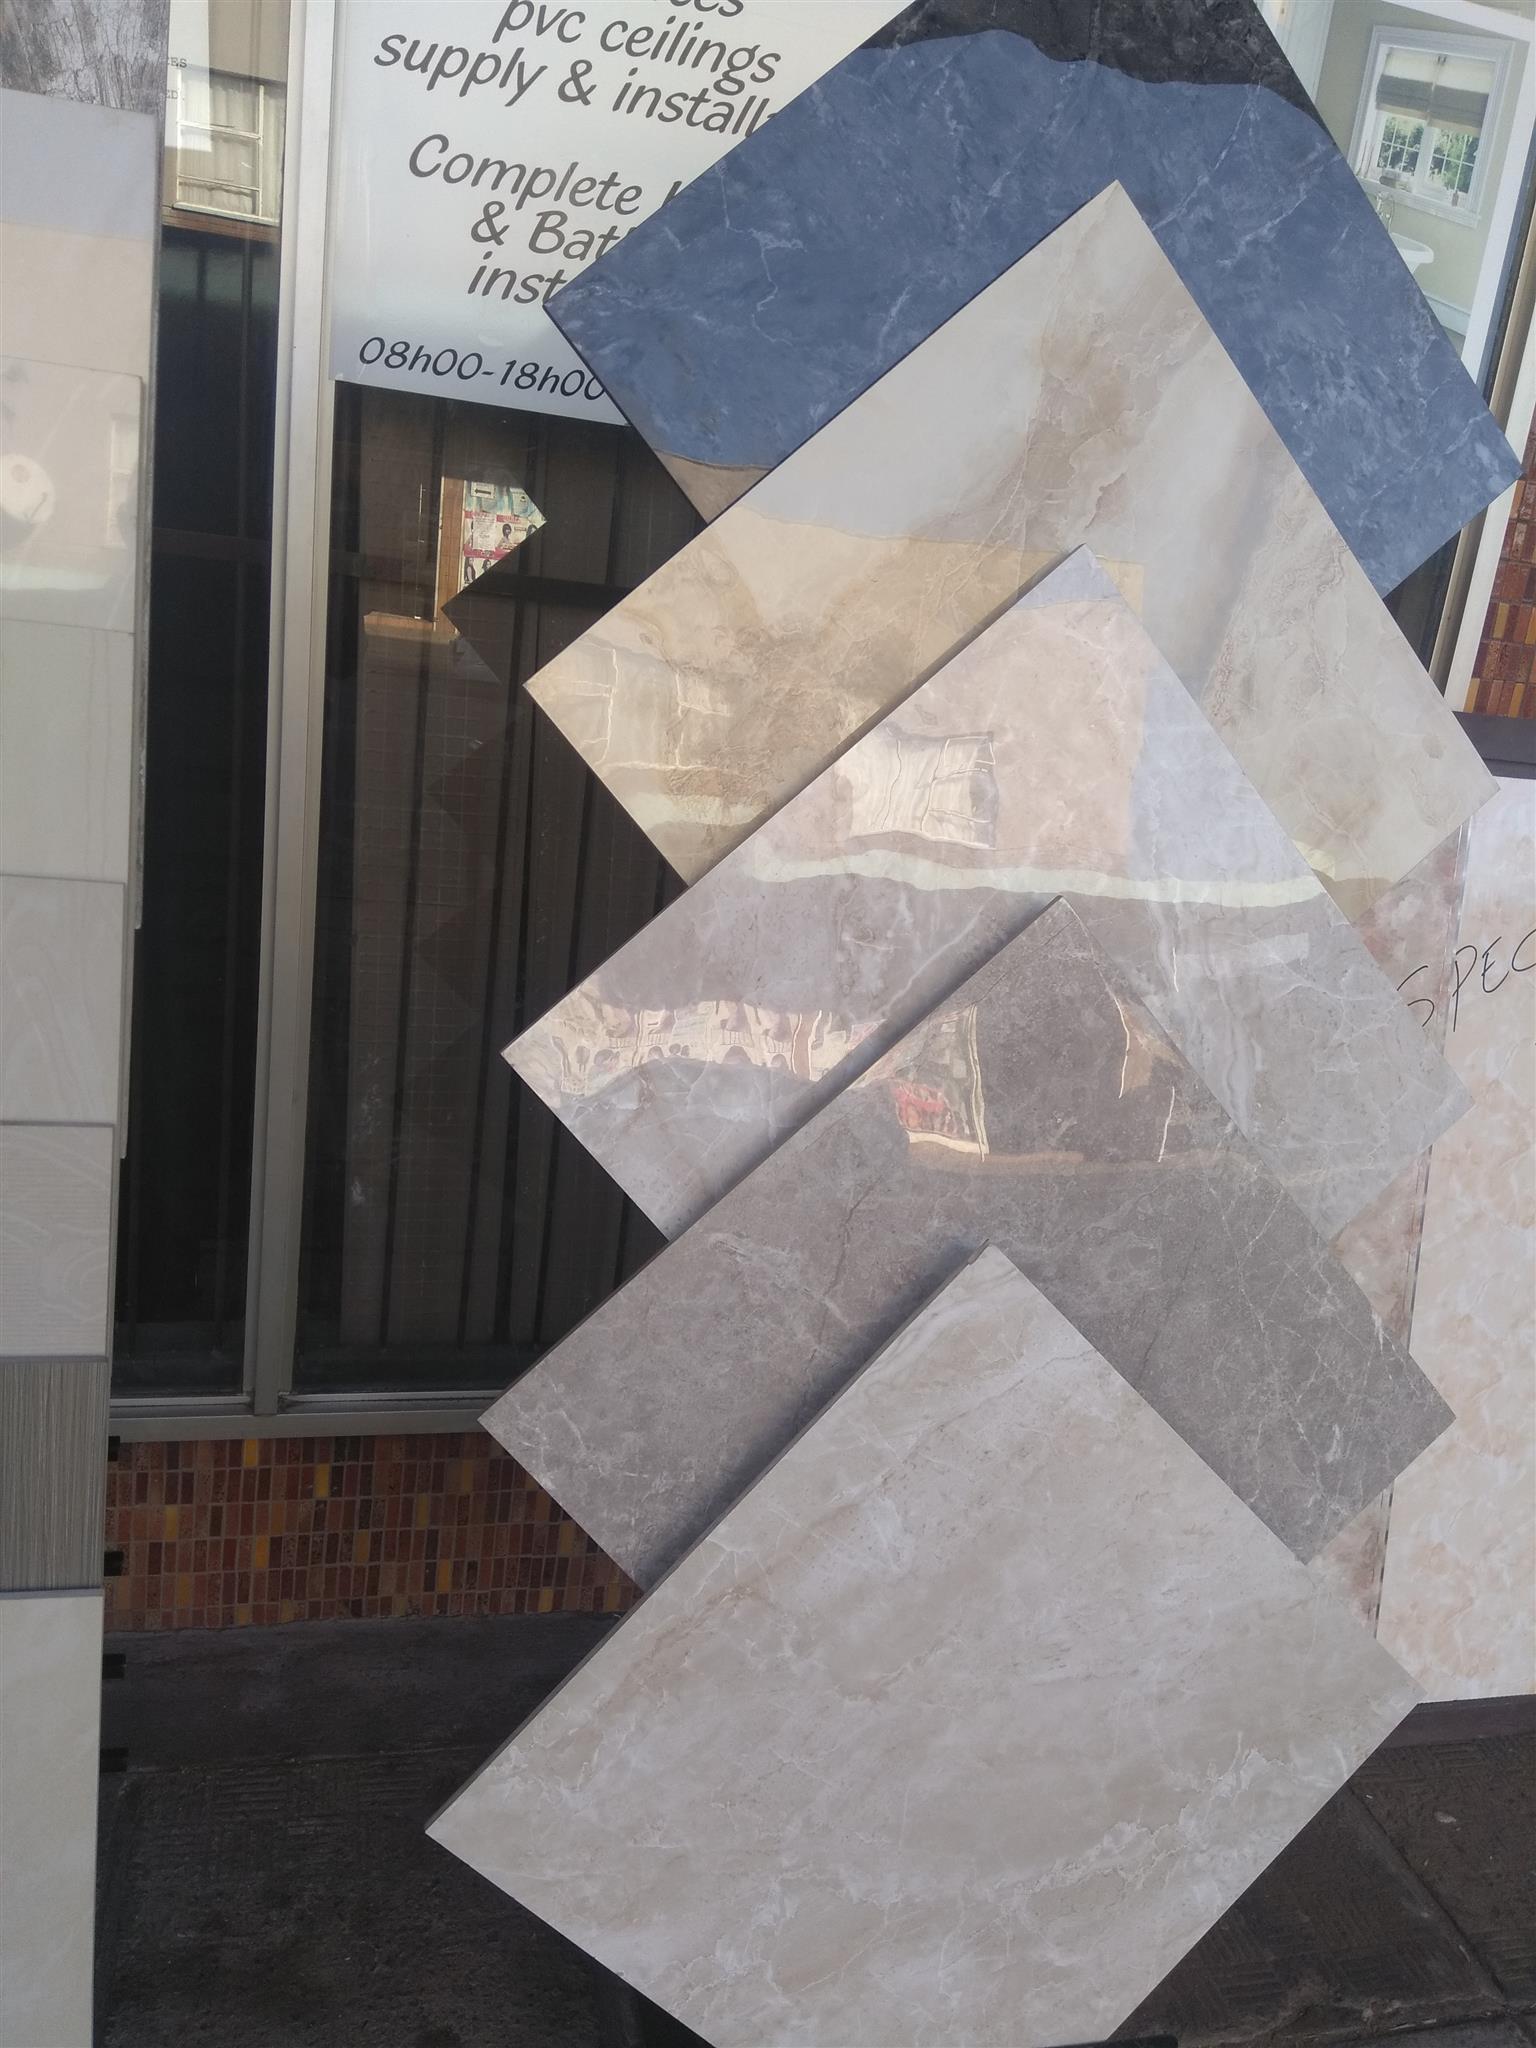 Porcelain Tiles And Pvc Ceilings Promotion